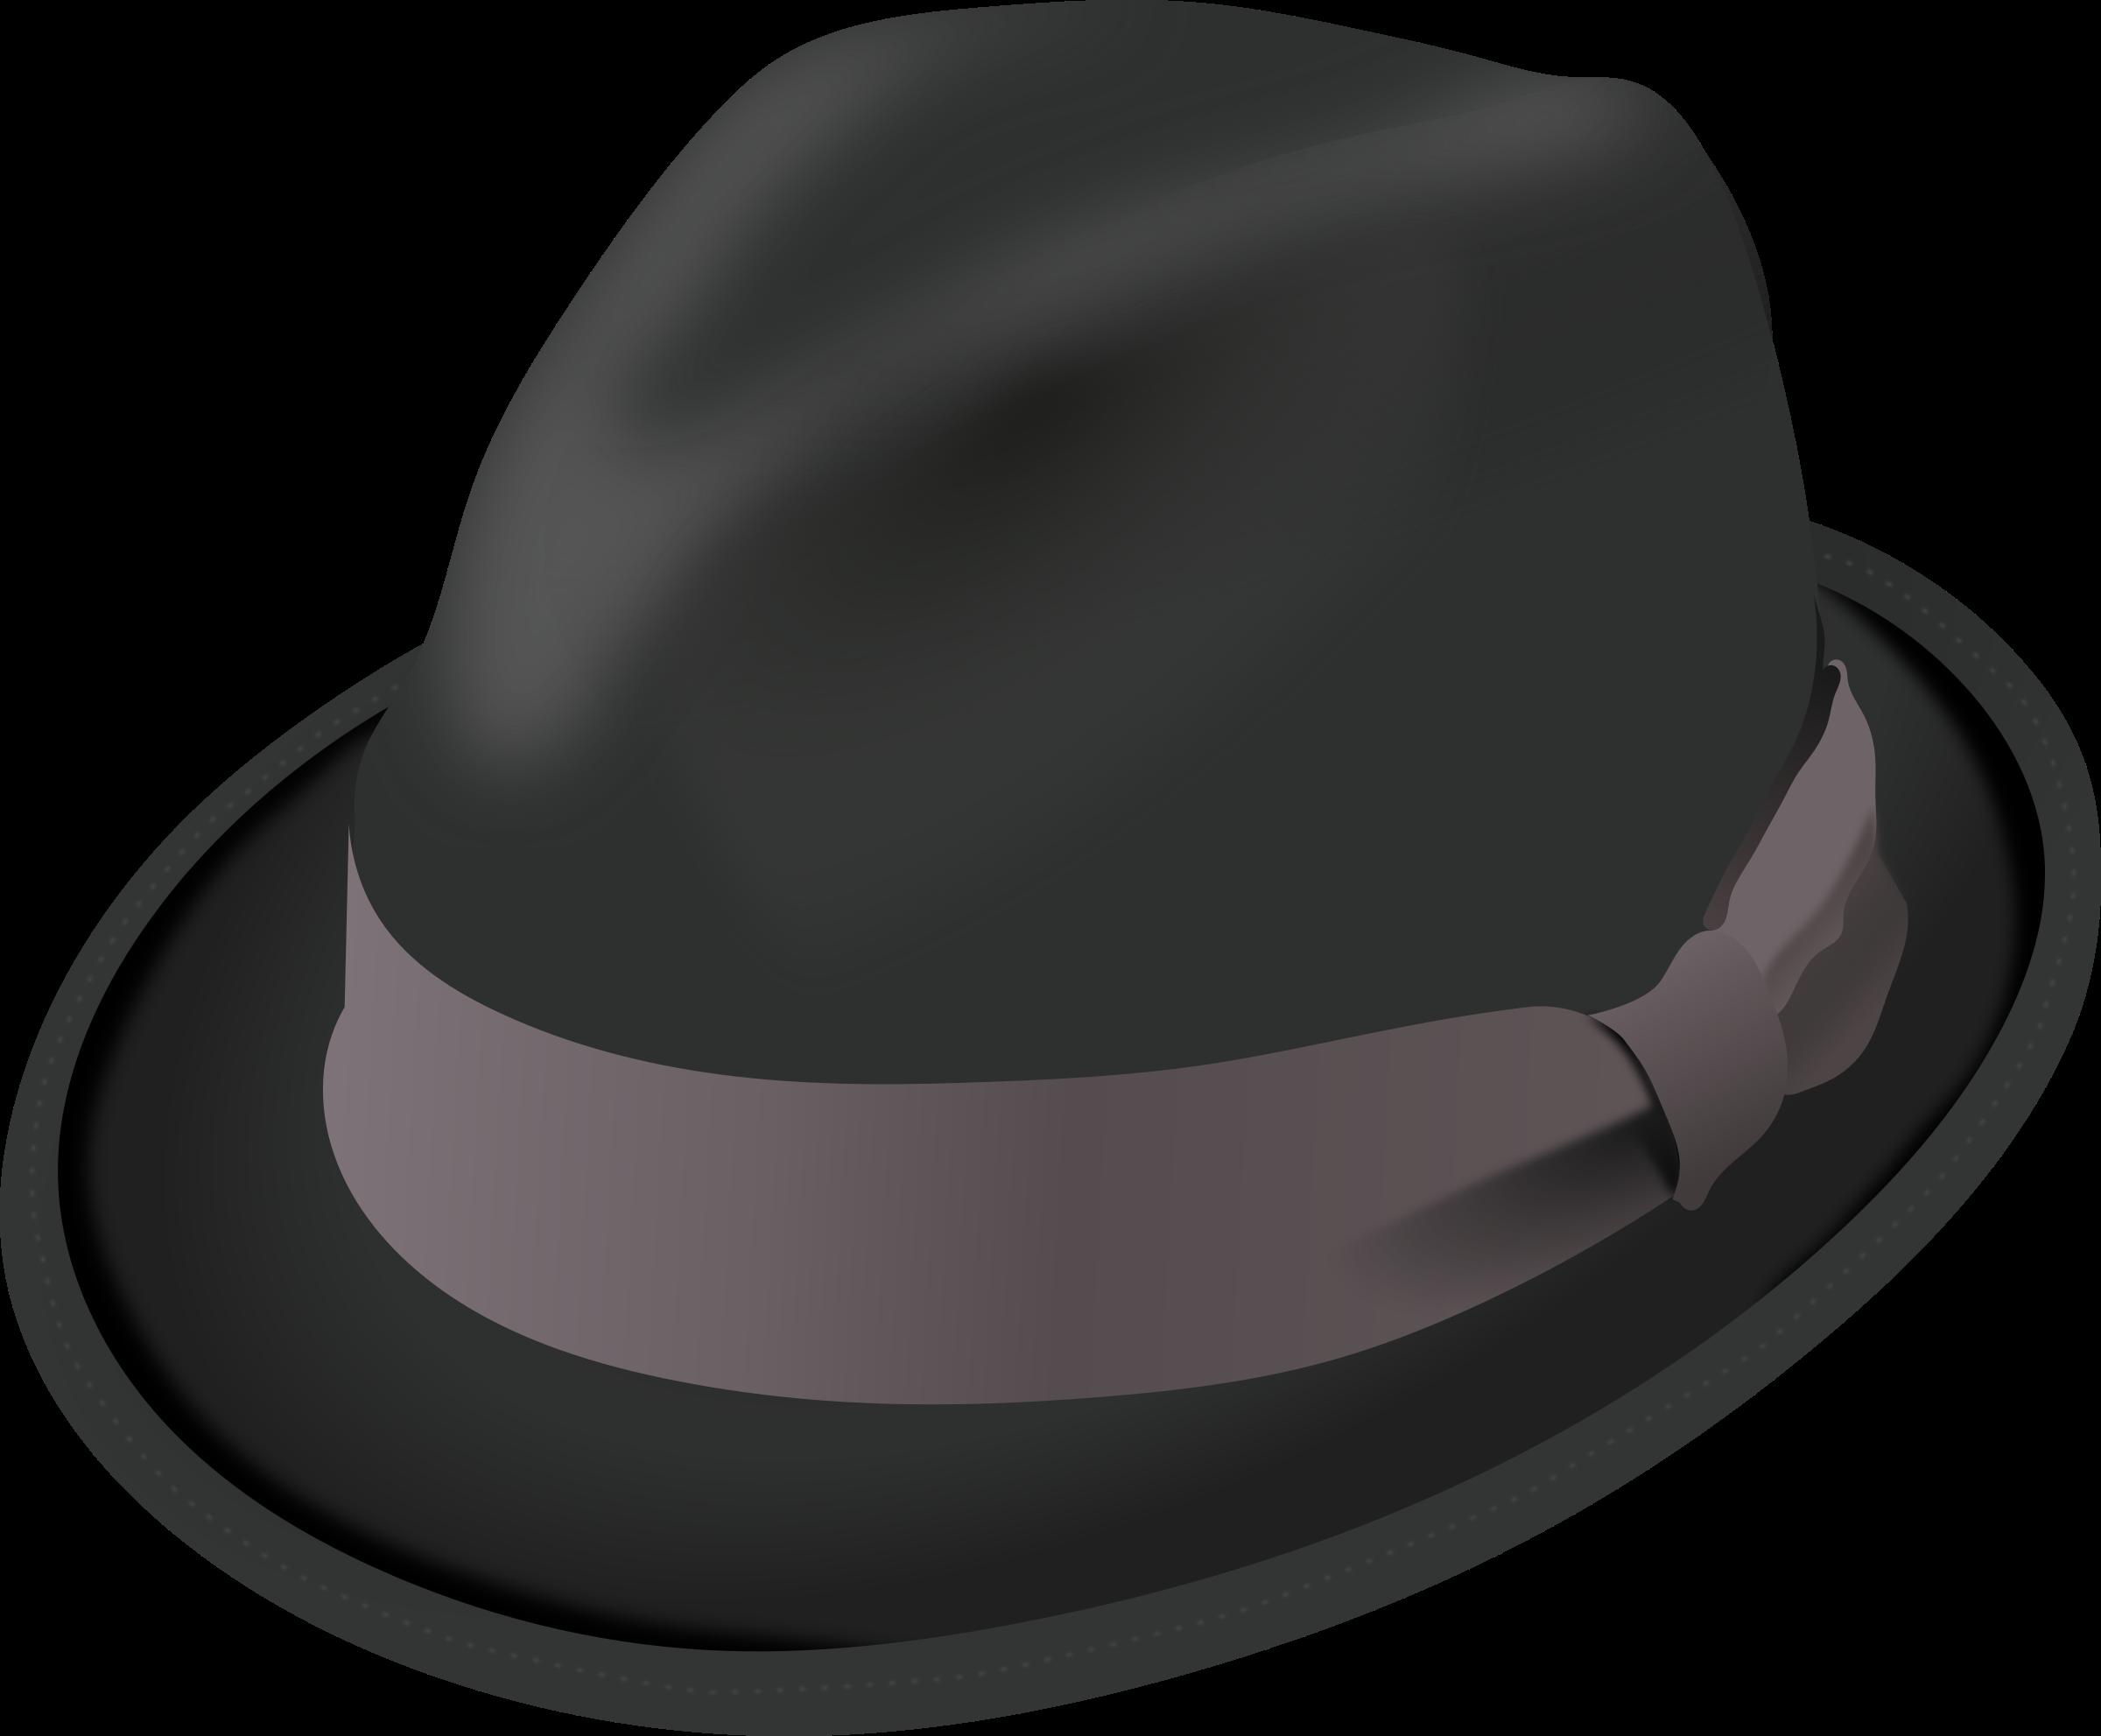 Trilby big image png. Fedora clipart alpine hat